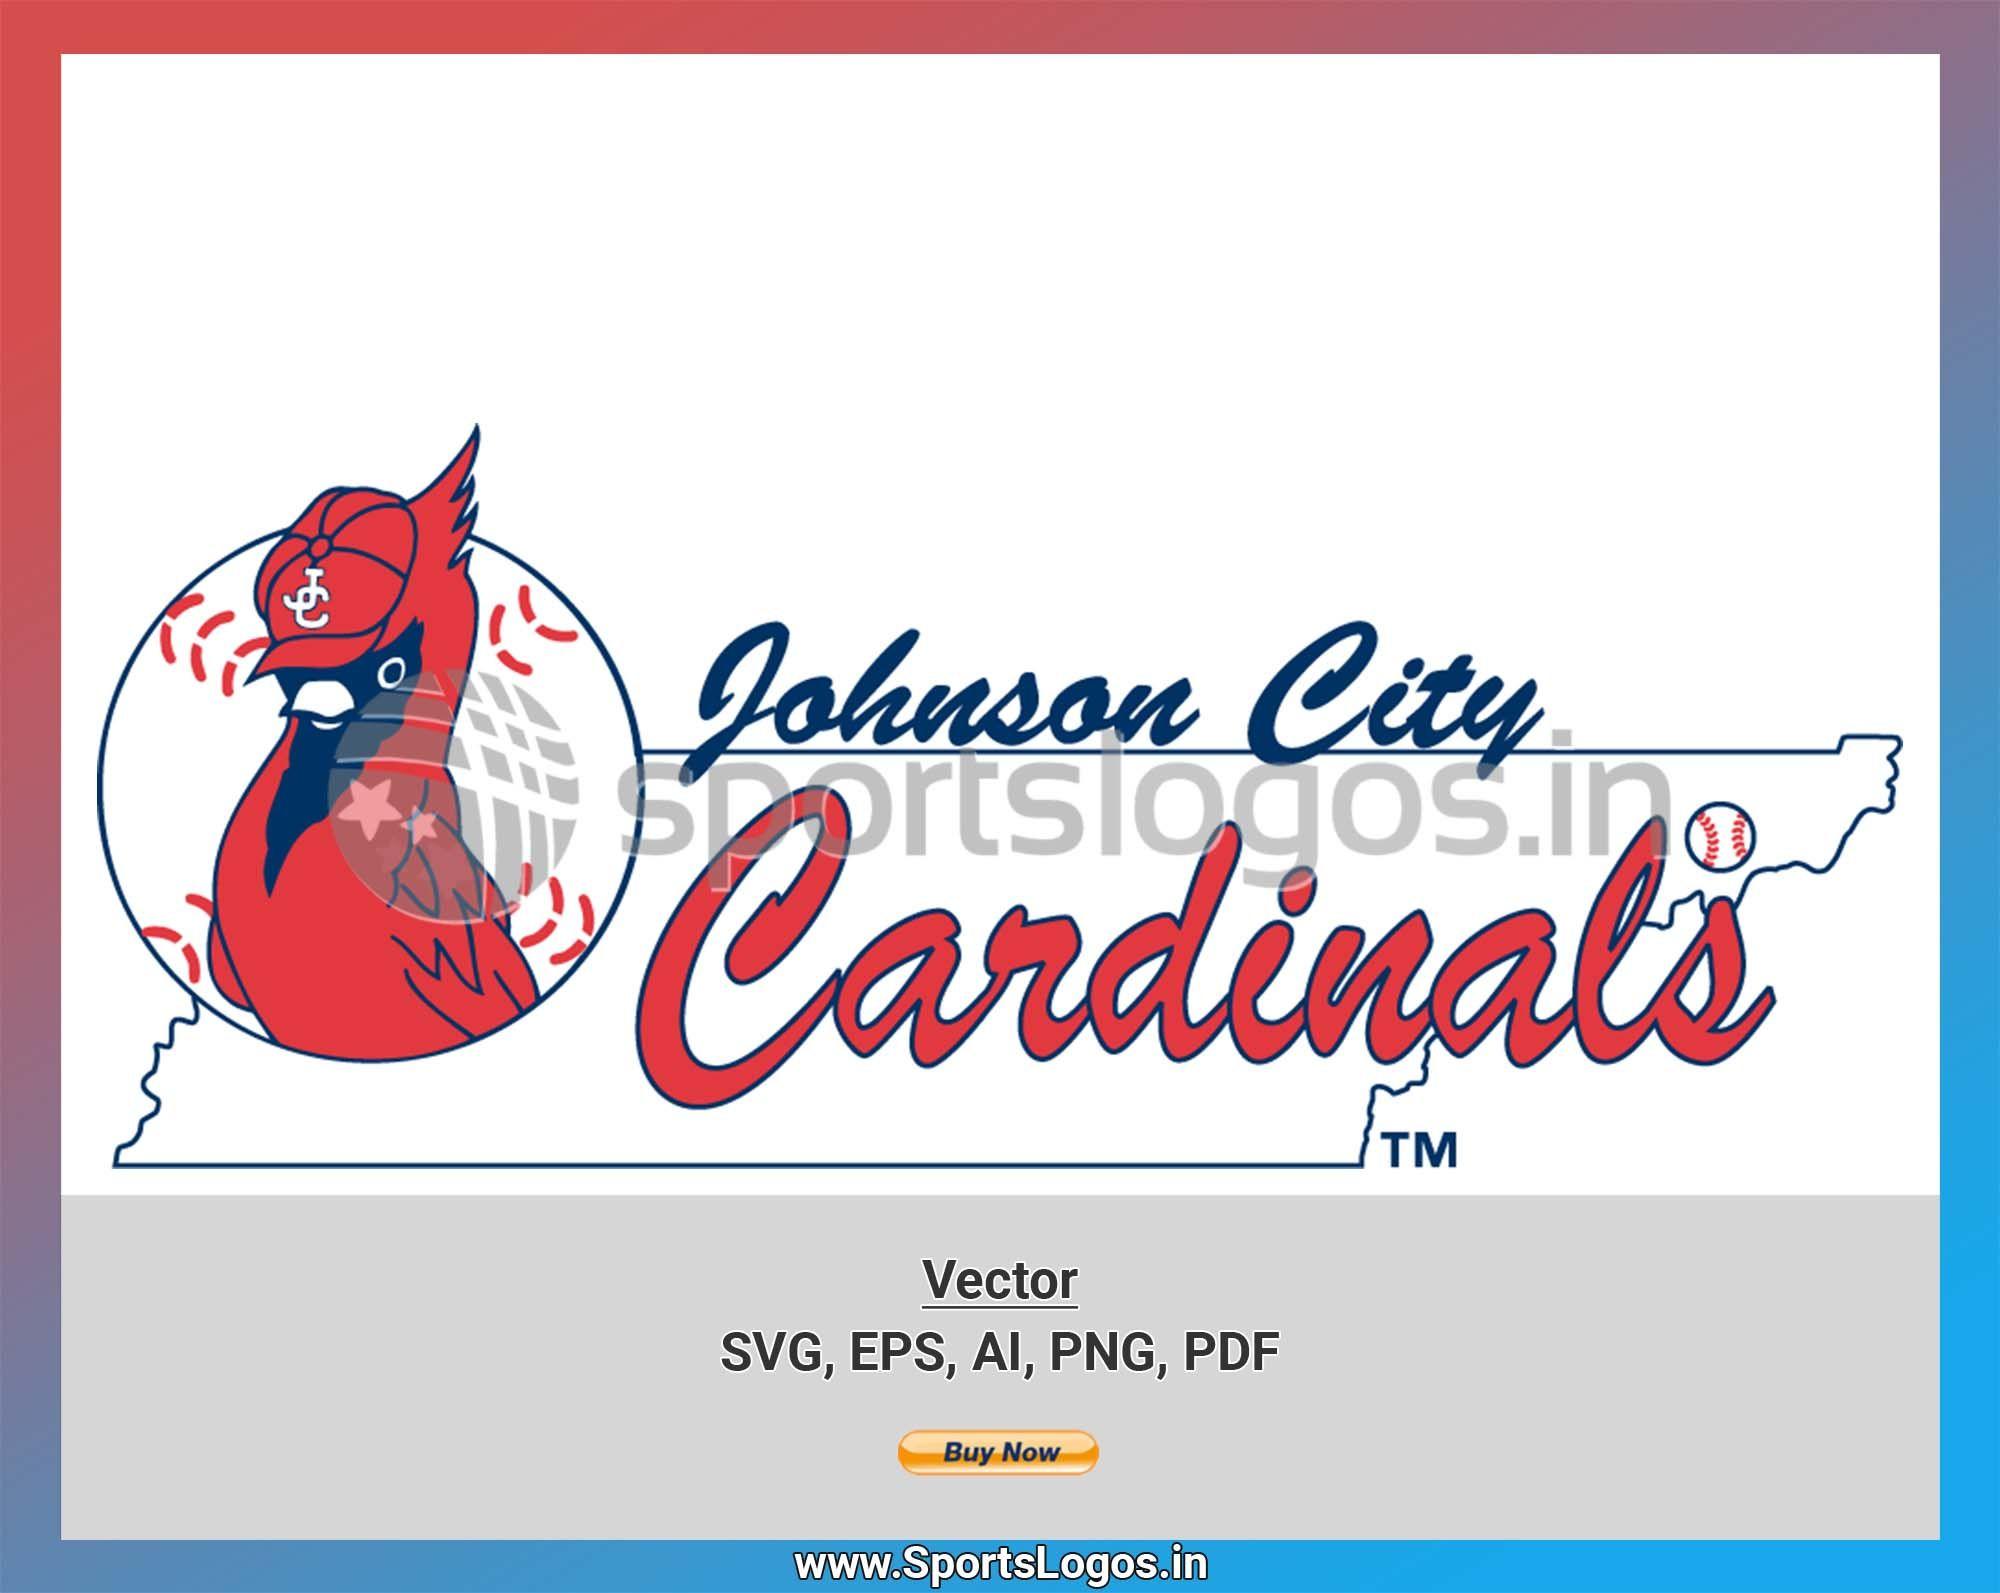 Johnson City Cardinals Baseball Sports Vector SVG Logo